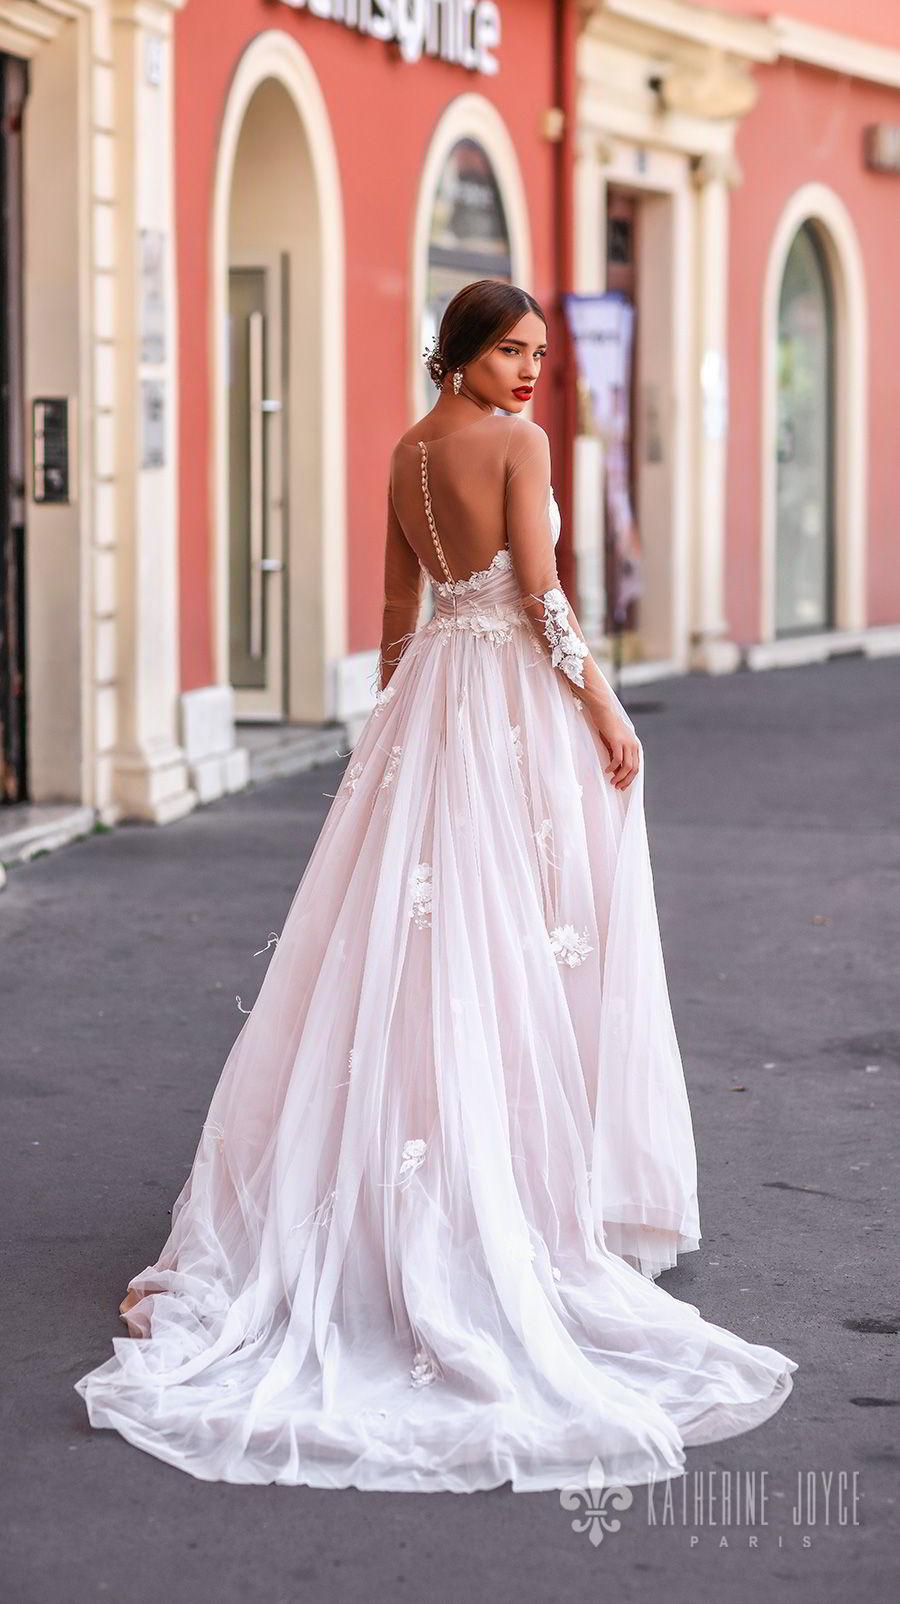 katherine joyce 2018 bridal sheer long sleeves illusion bateau strapless sweetheart neckline heavily embellished bodice romantic pink a  line wedding dress chapel train (catalina) bv